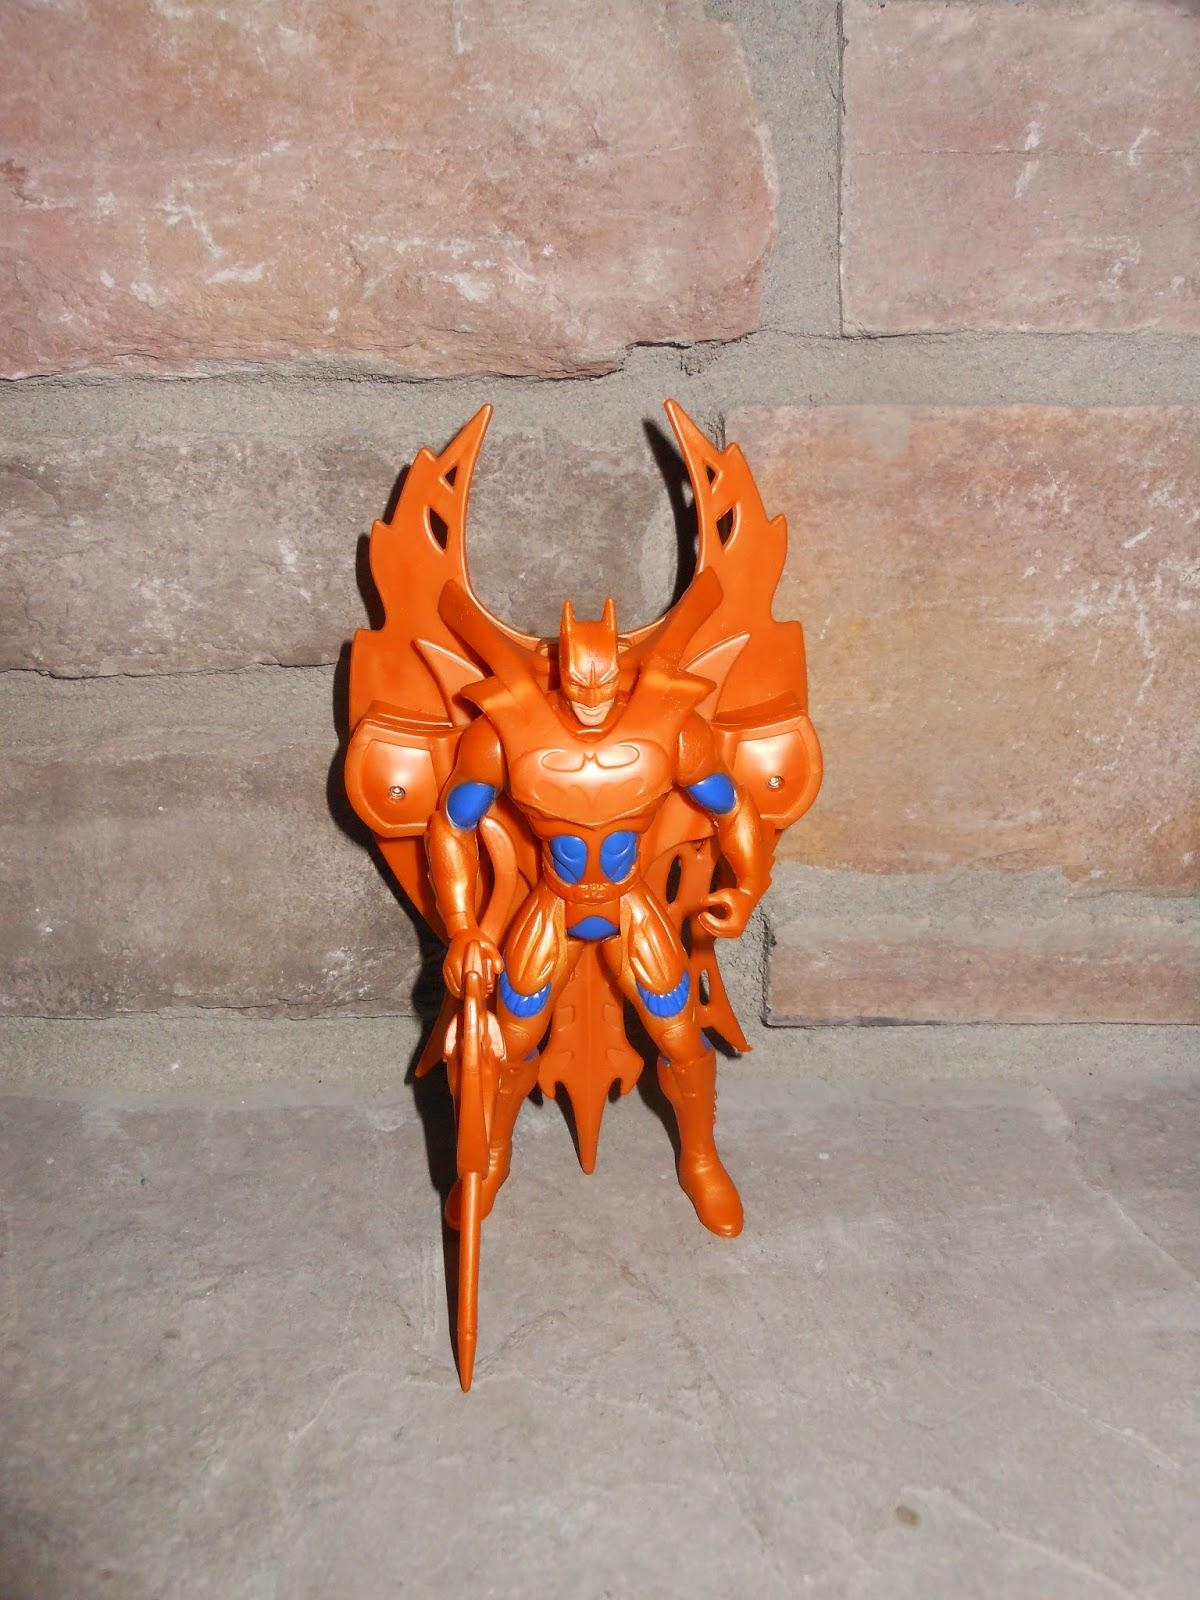 batman_wing_blast_1.JPG